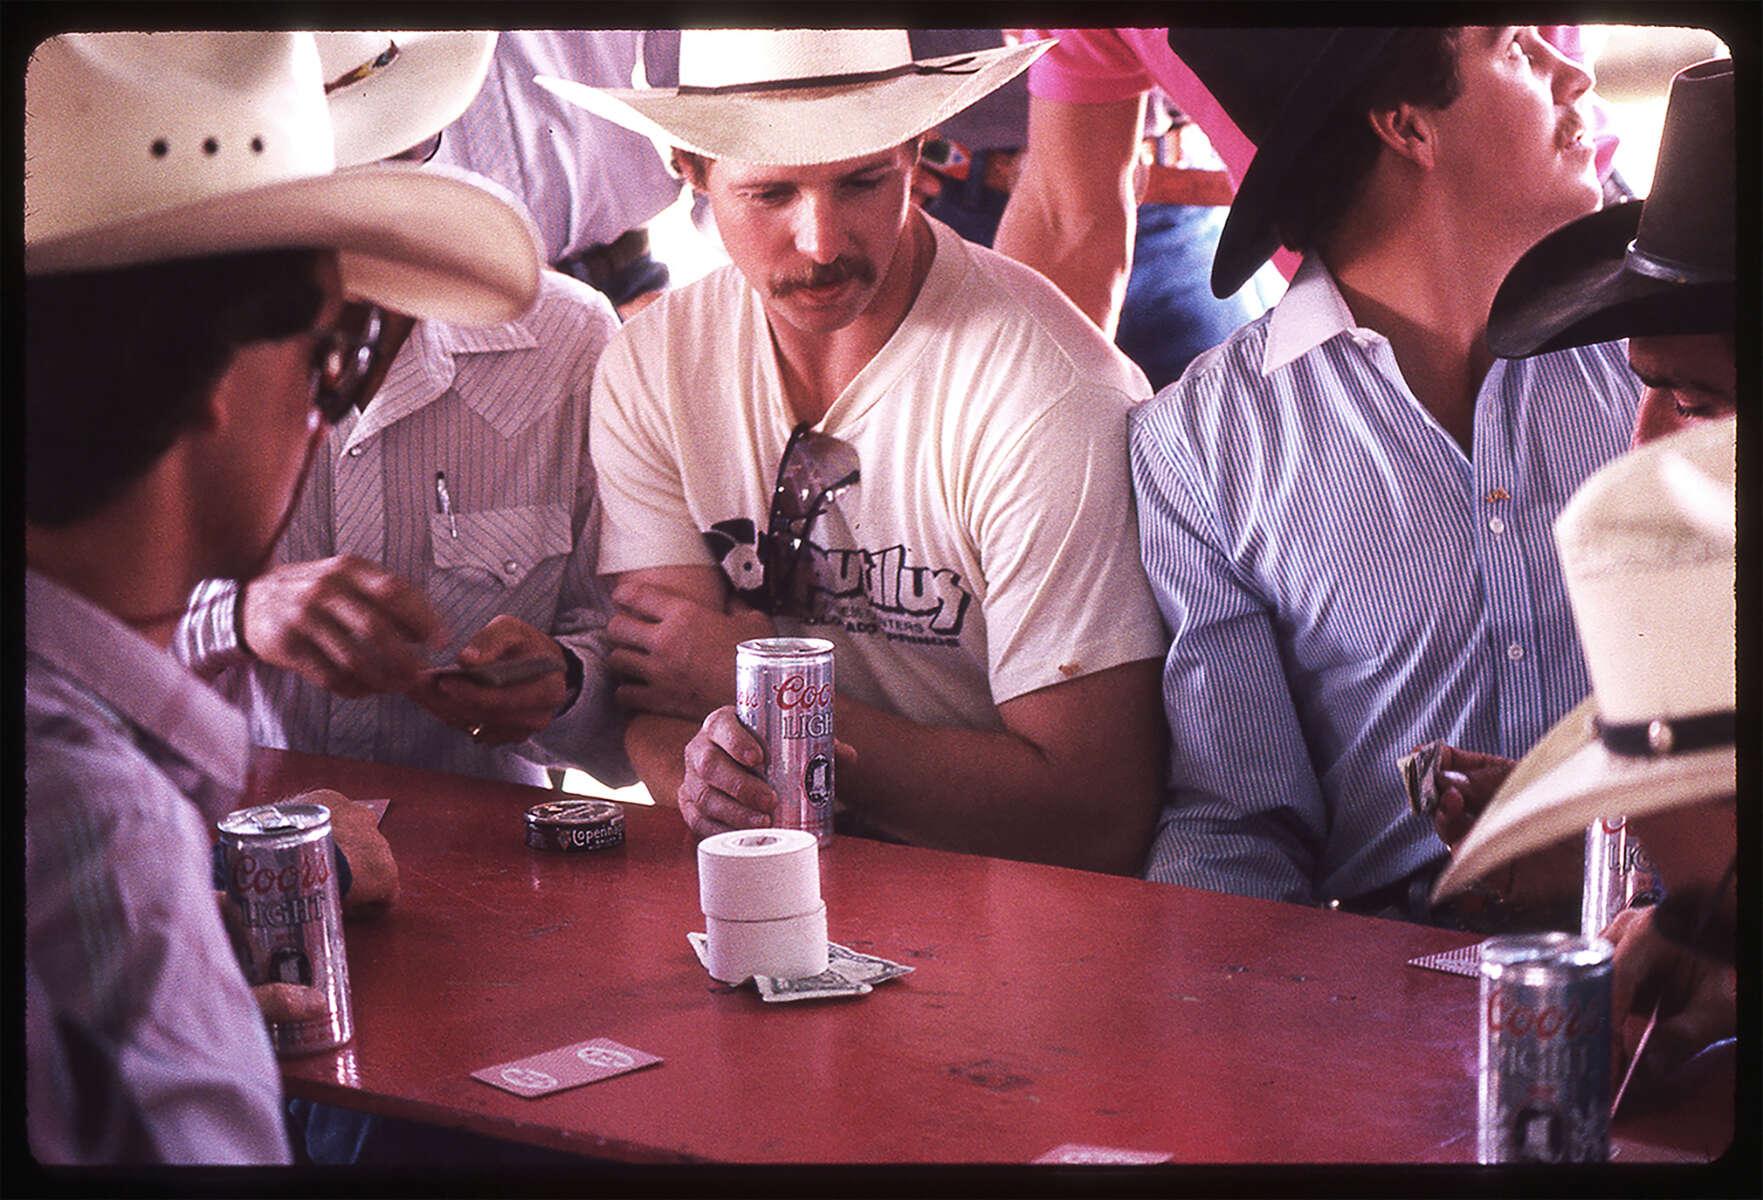 019_-cowboys